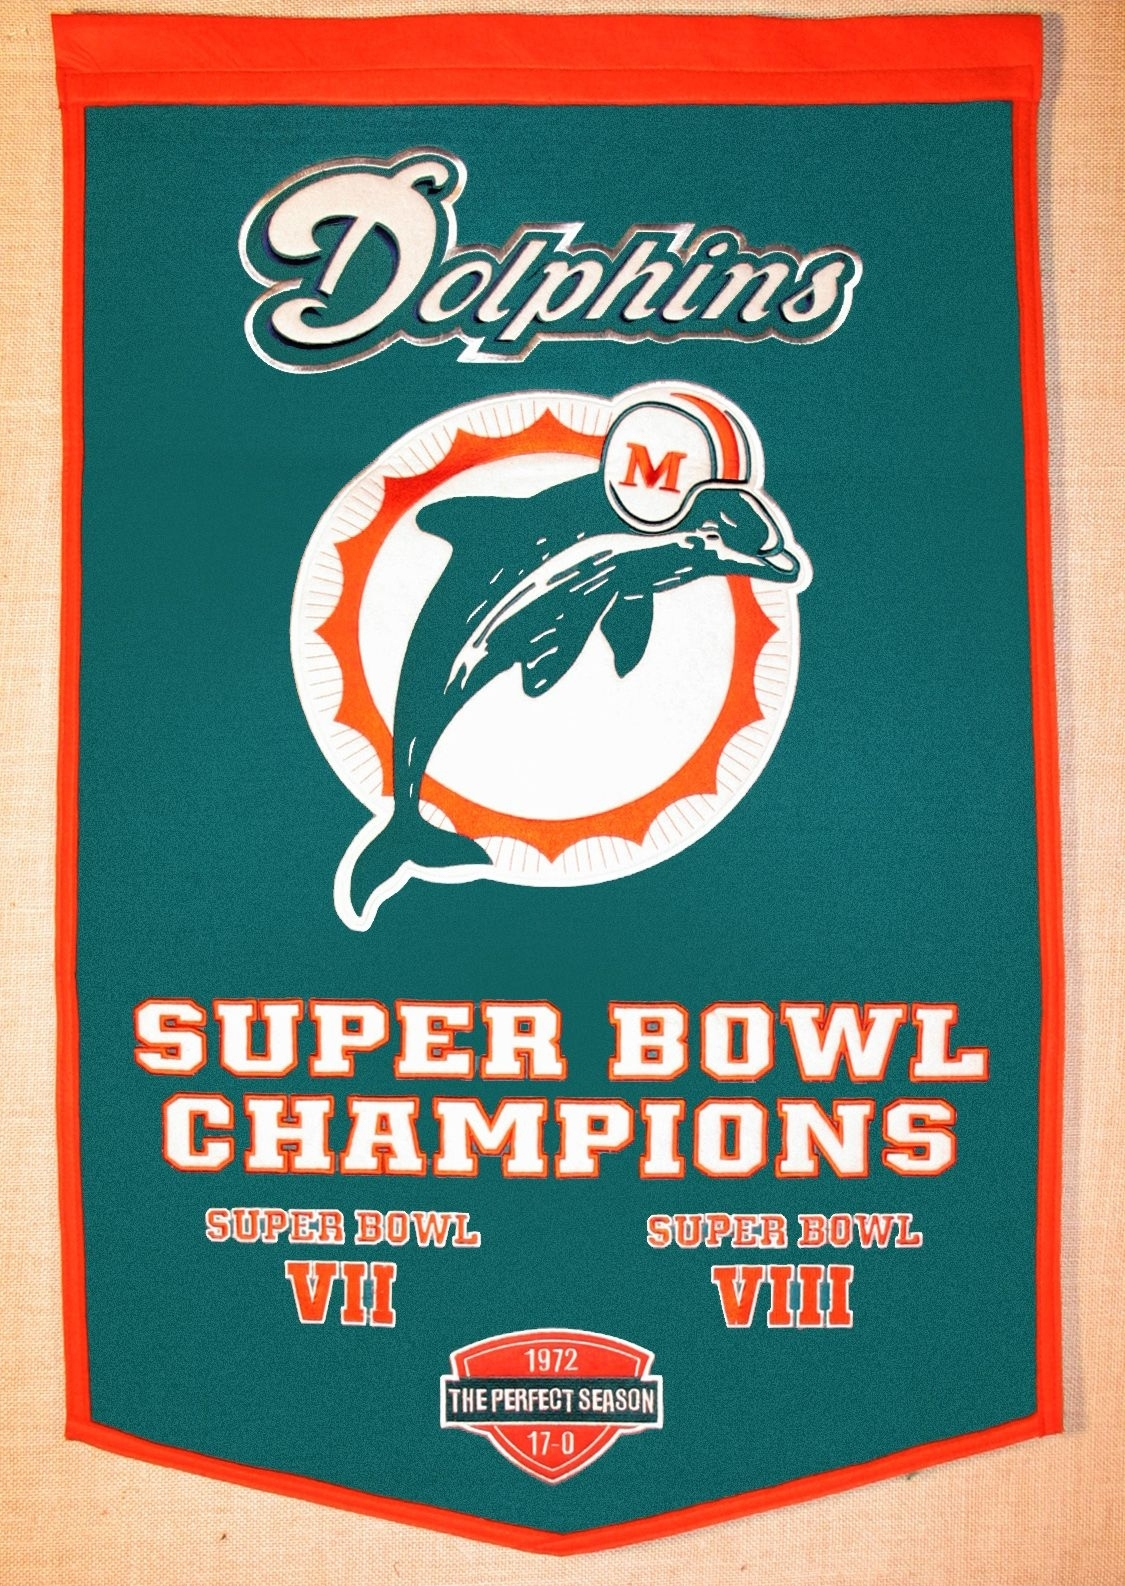 Miami Dolphins Super Bowl Champs | Nfl Miami Dolphins, Miami in Miami Dolphins Undefeated Season Super Bowl